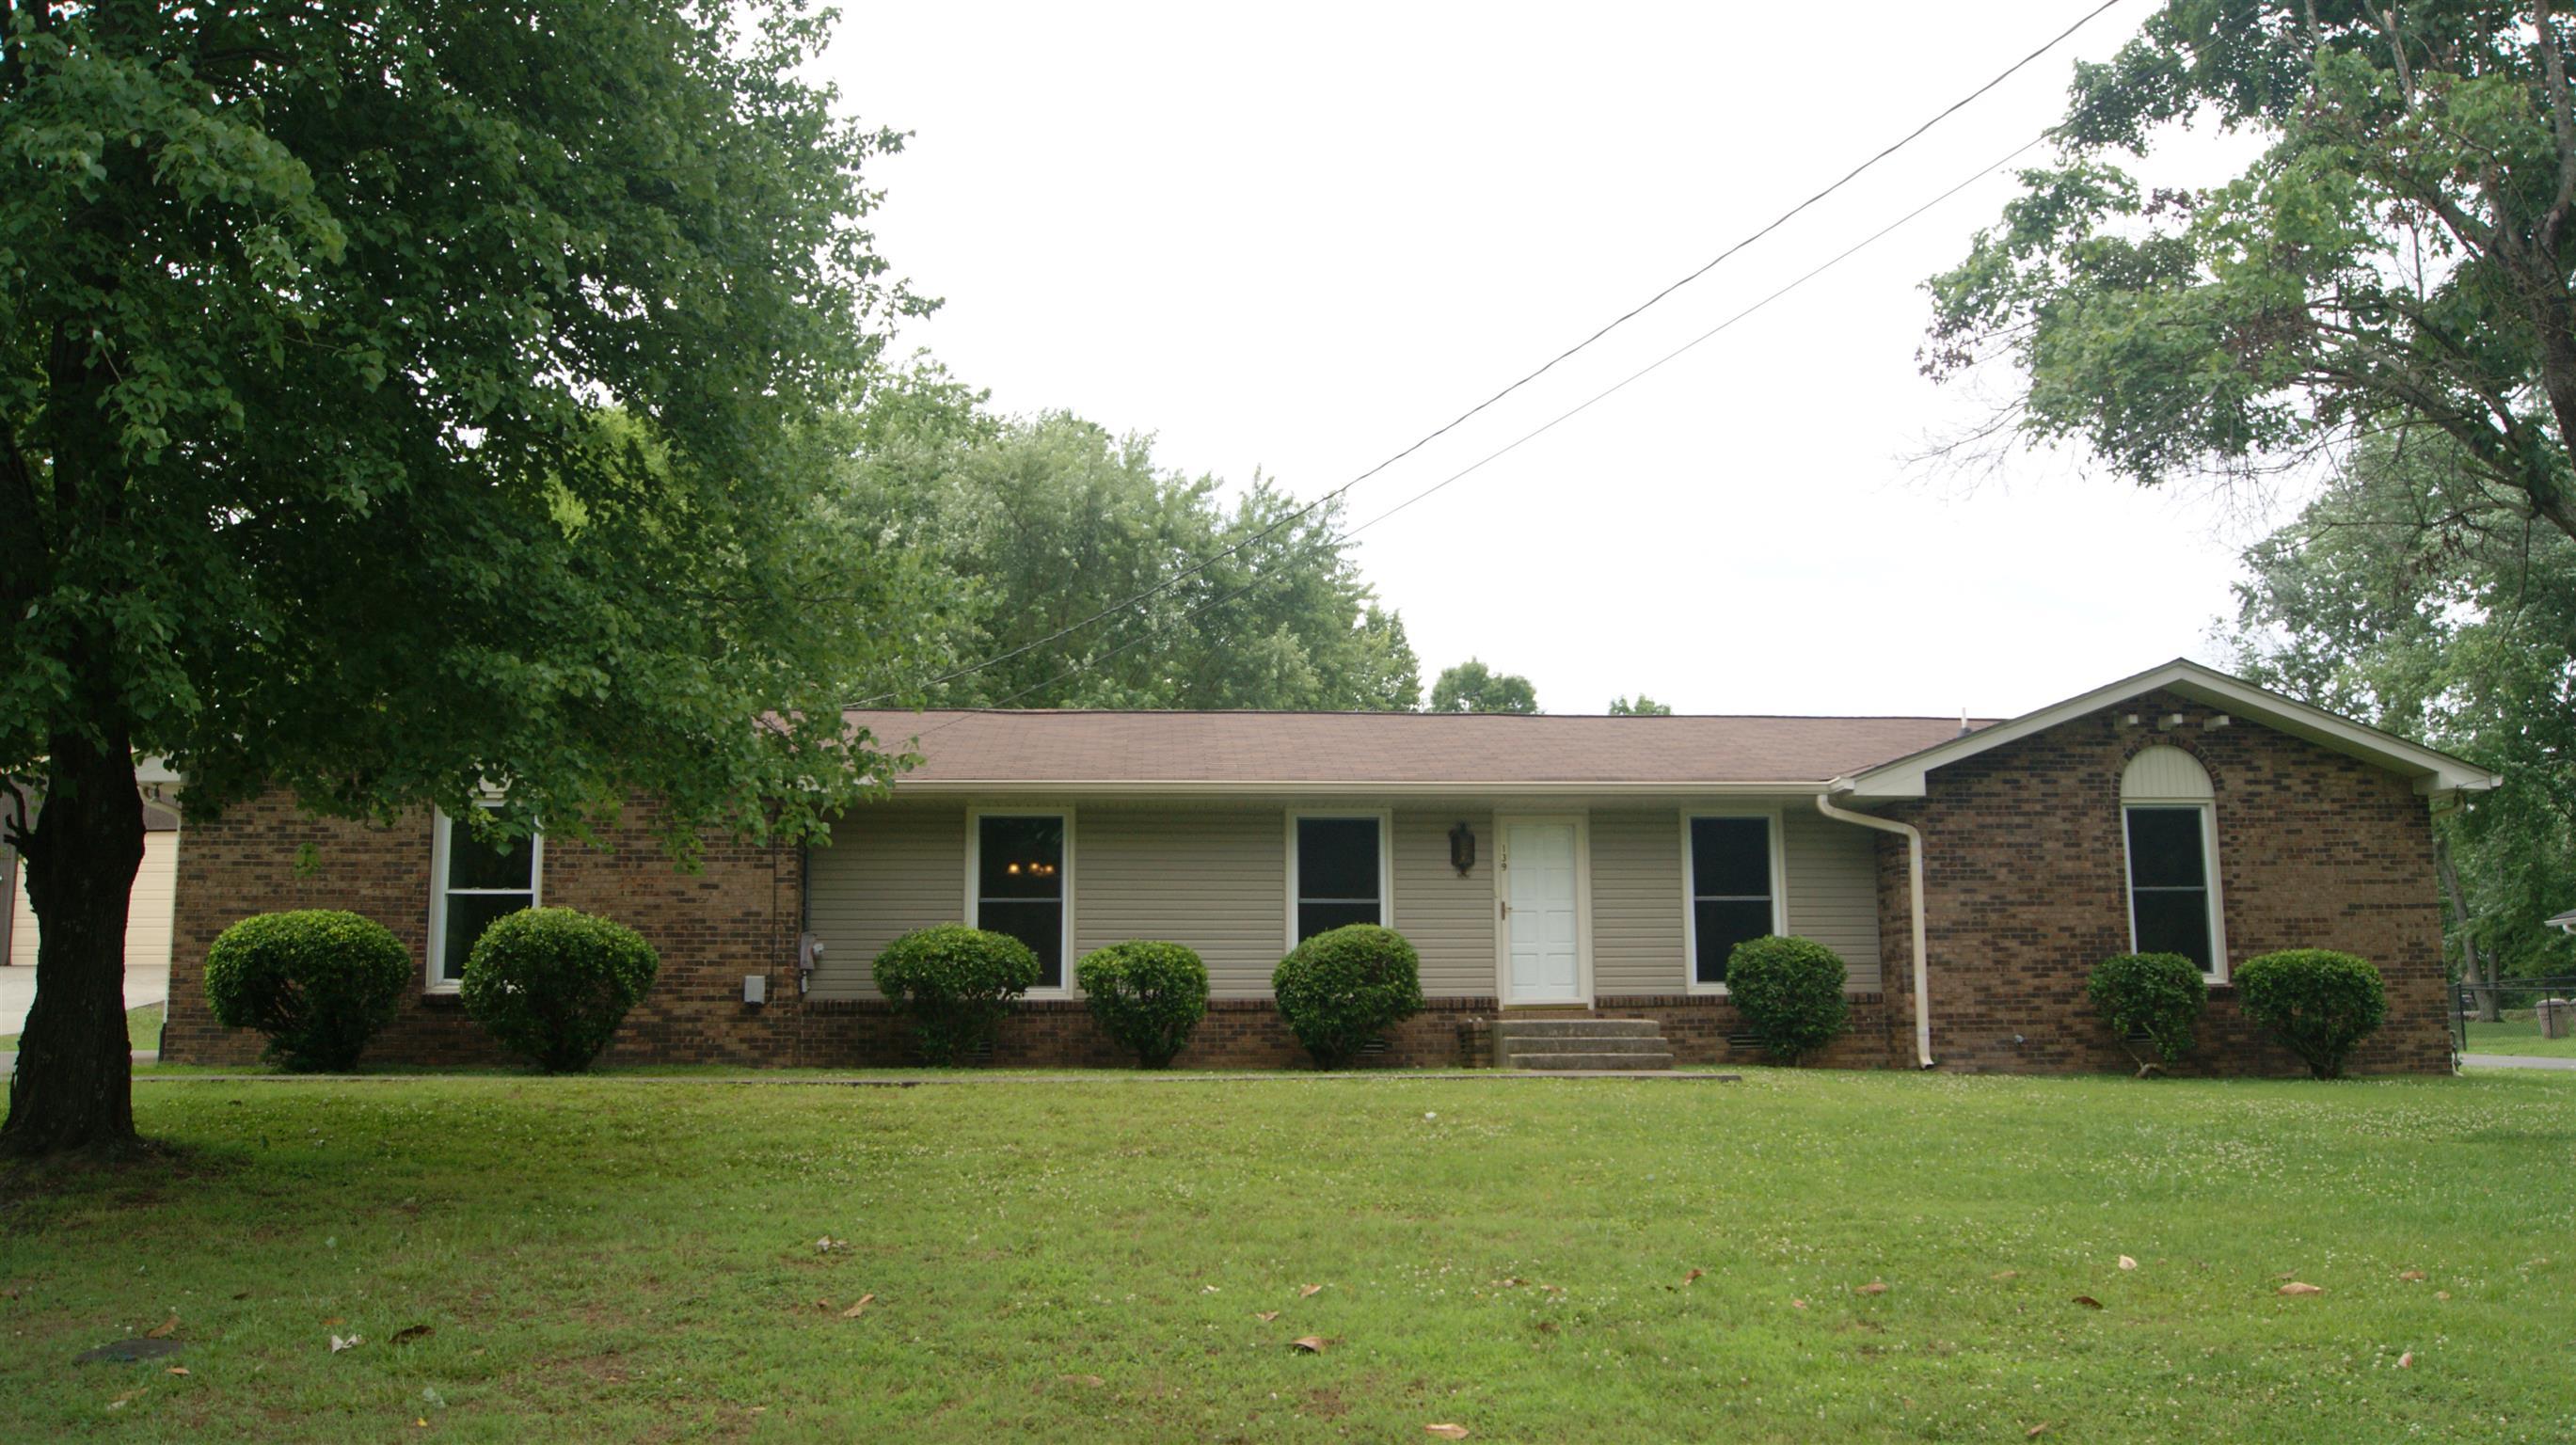 139 Pin Oak Dr, Hendersonville, Tennessee